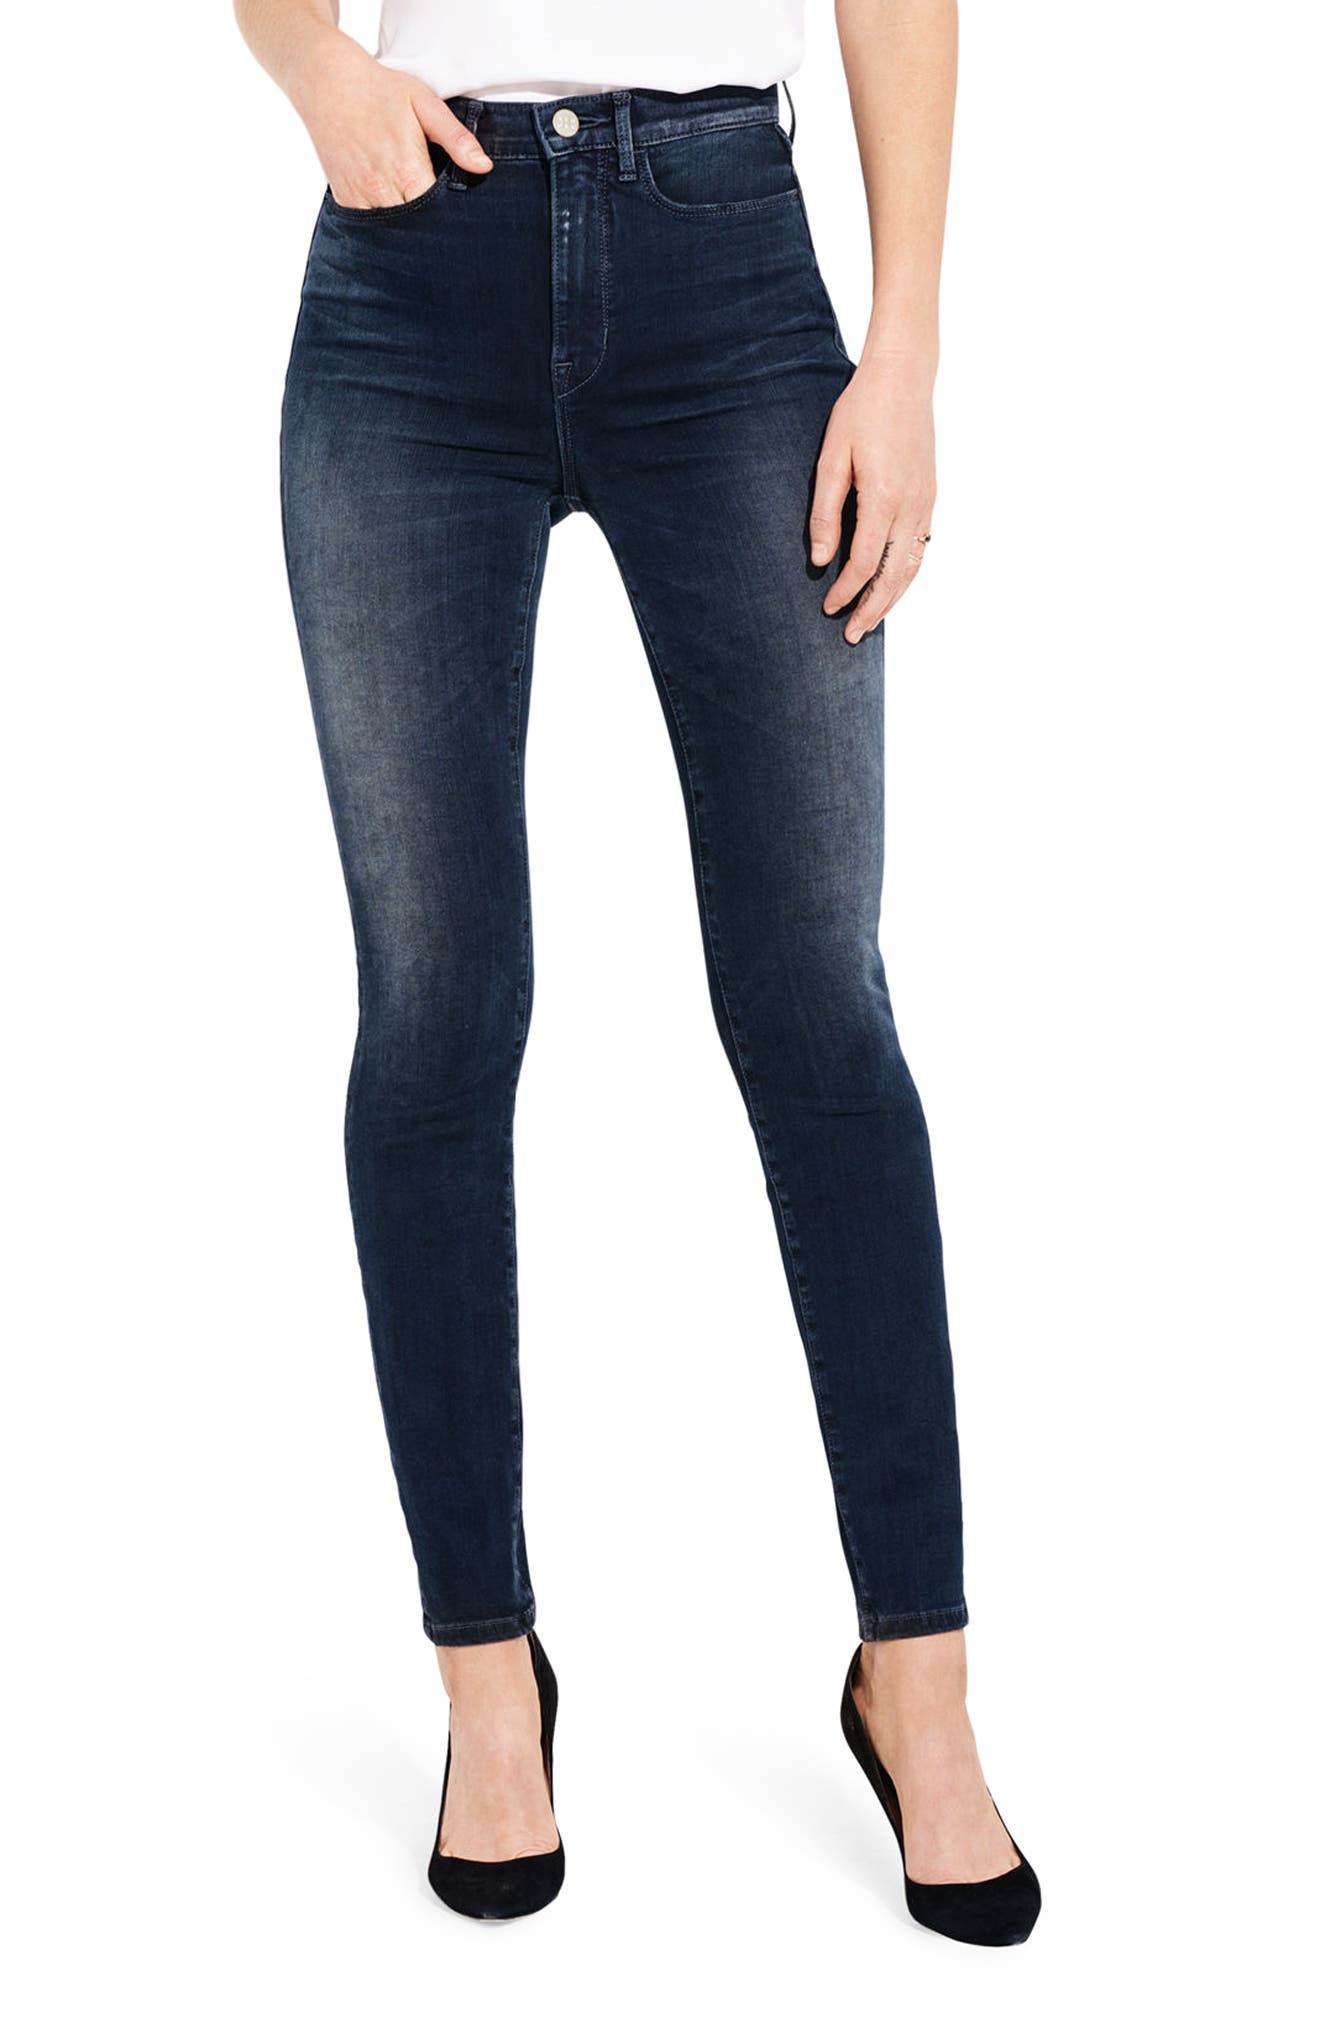 Alternate Image 1 Selected - AYR The Riser High Waist Skinny Jeans (Jaguar Legs)